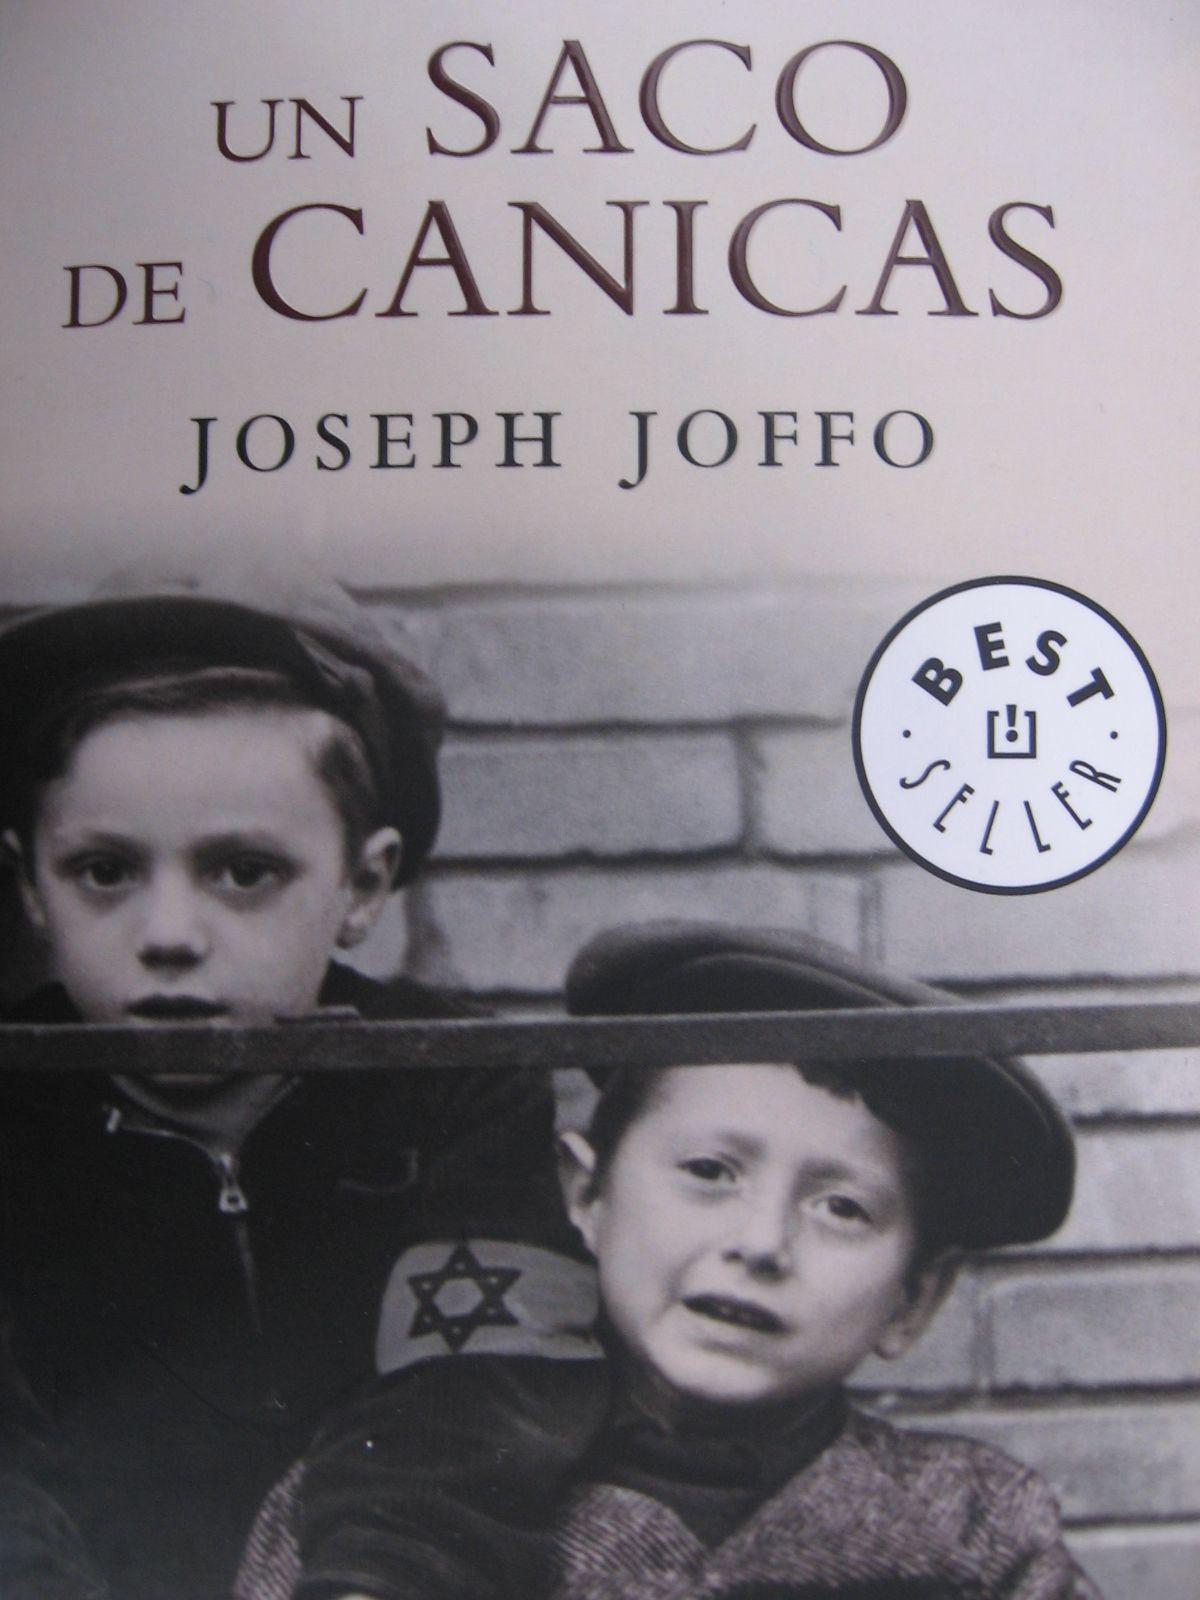 Mi biblioteca libros interesantes libros recomendados canicas lengua literatura leer novelas literarias libros buenos